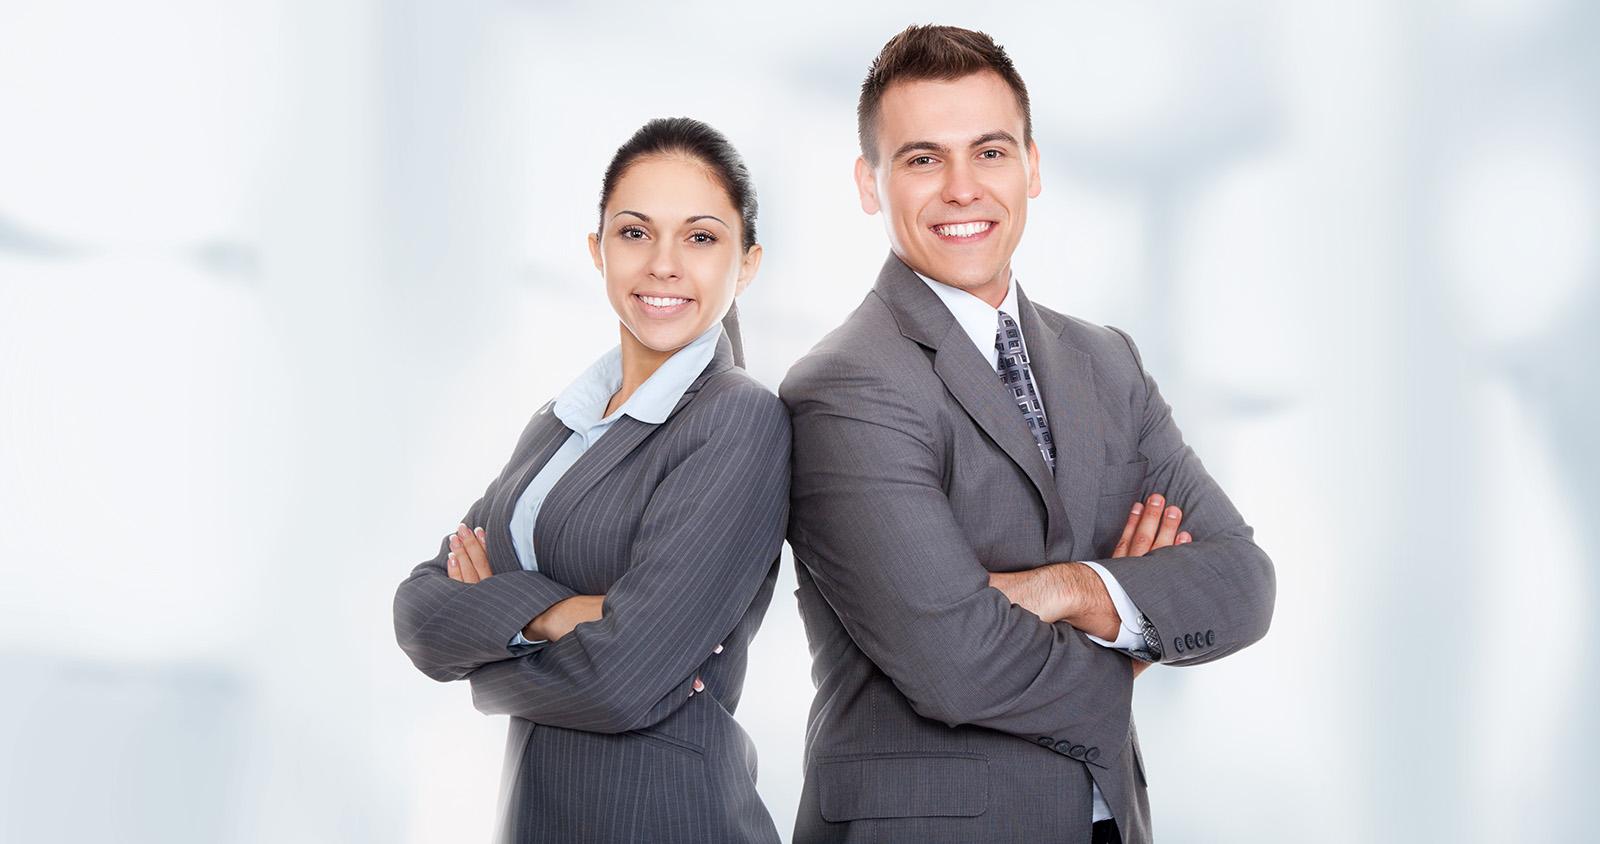 choose-business-partner2x